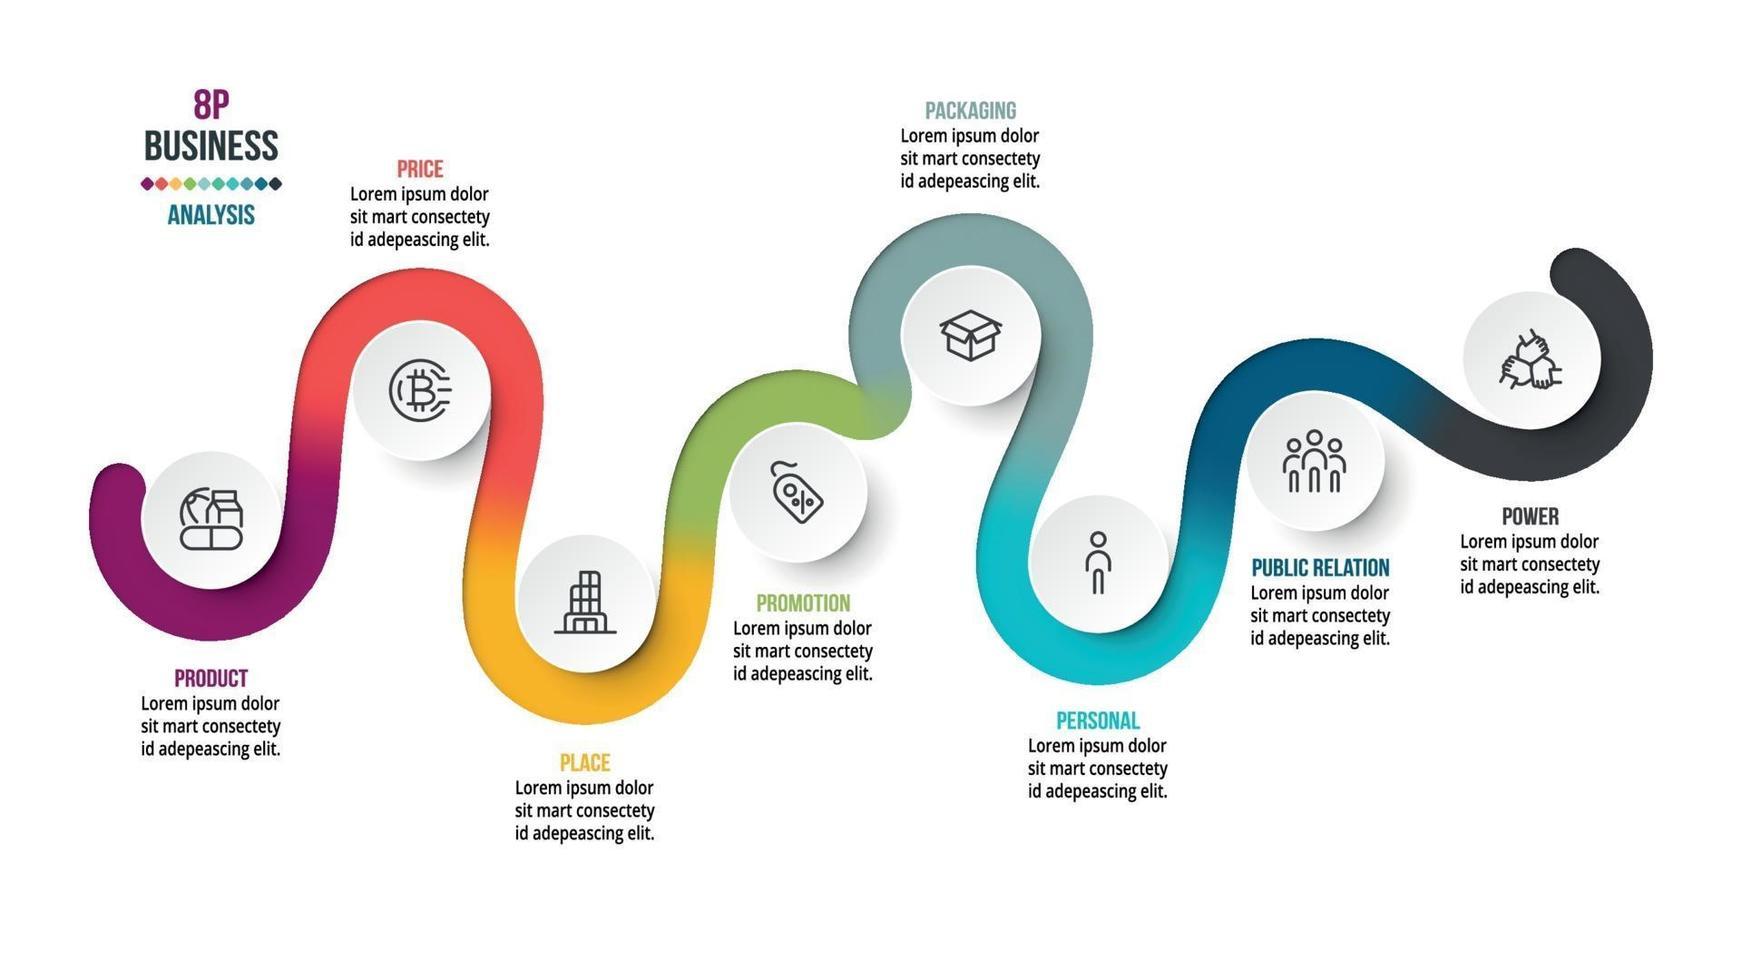 8p Analyse Business oder Marketing Infografik Vorlage. vektor